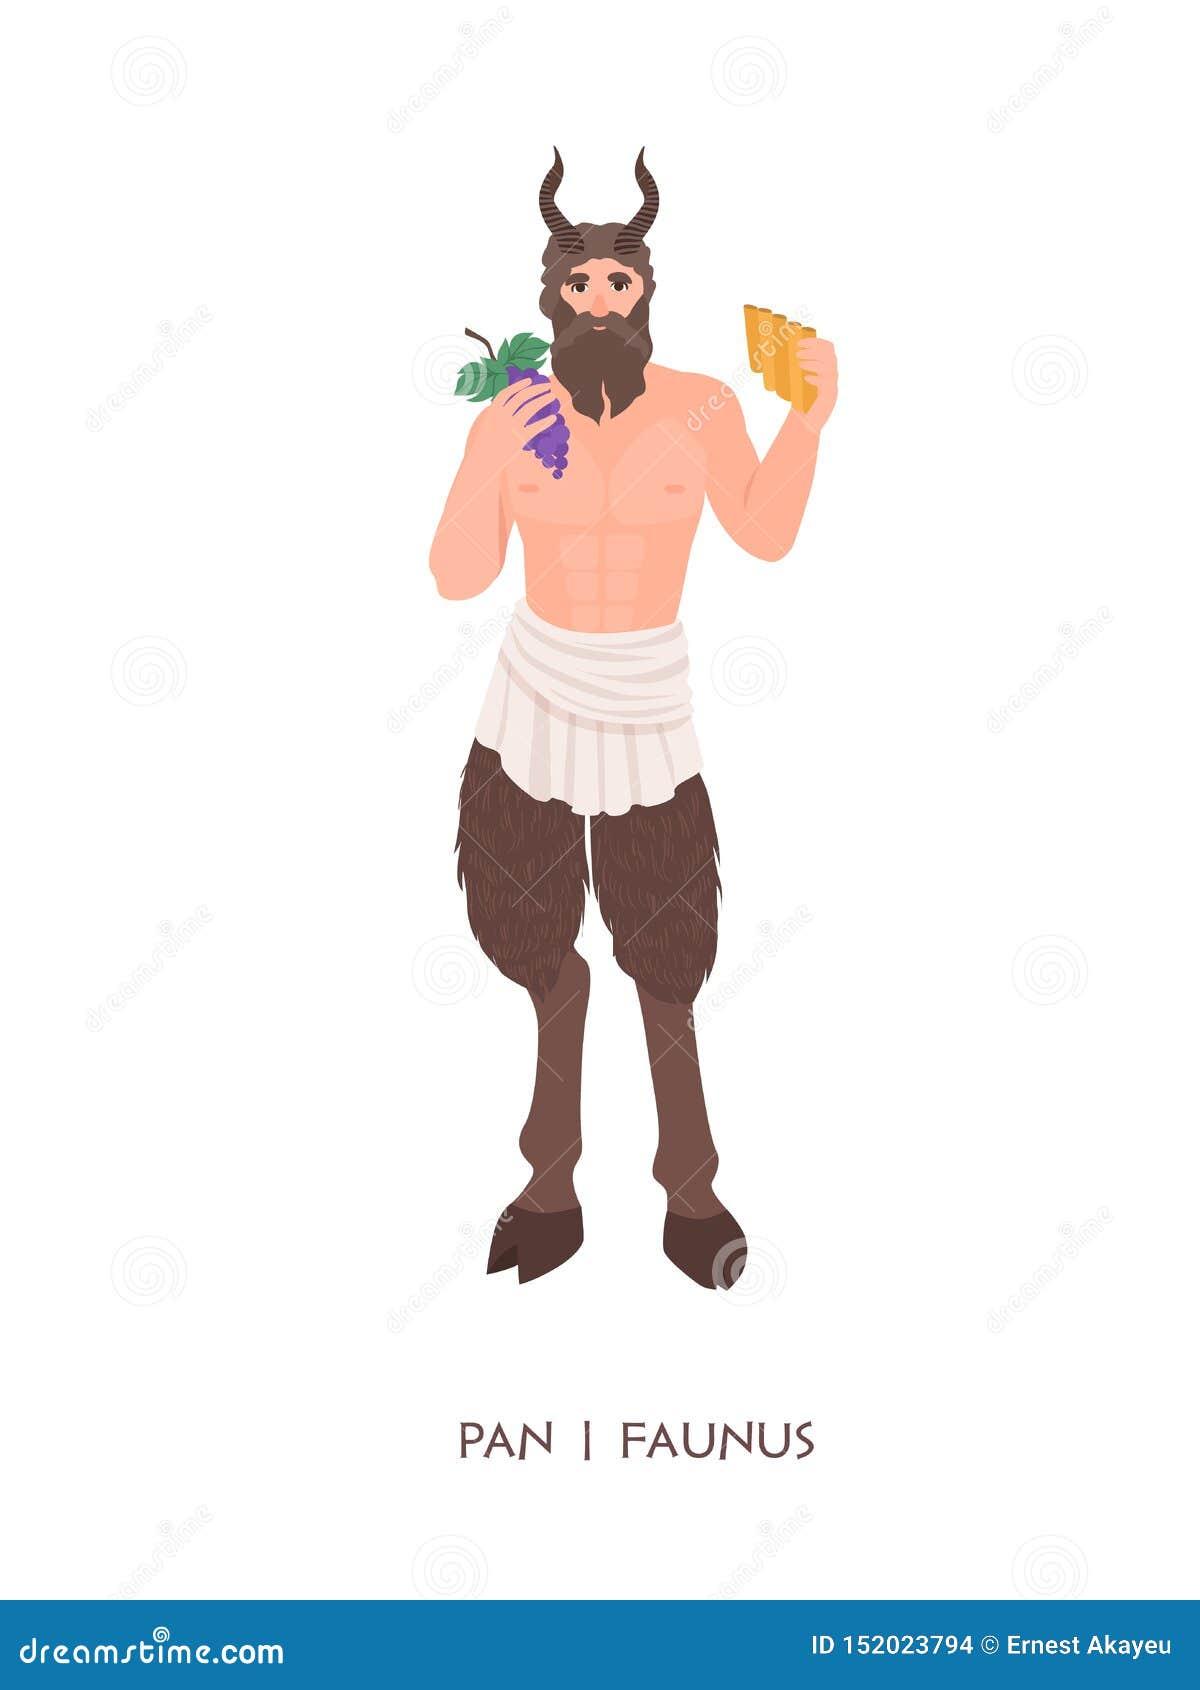 Pan of Faunus - god of deity van herders en vruchtbaarheid van oude Griekse en Roman godsdienst Mythologisch mannetje